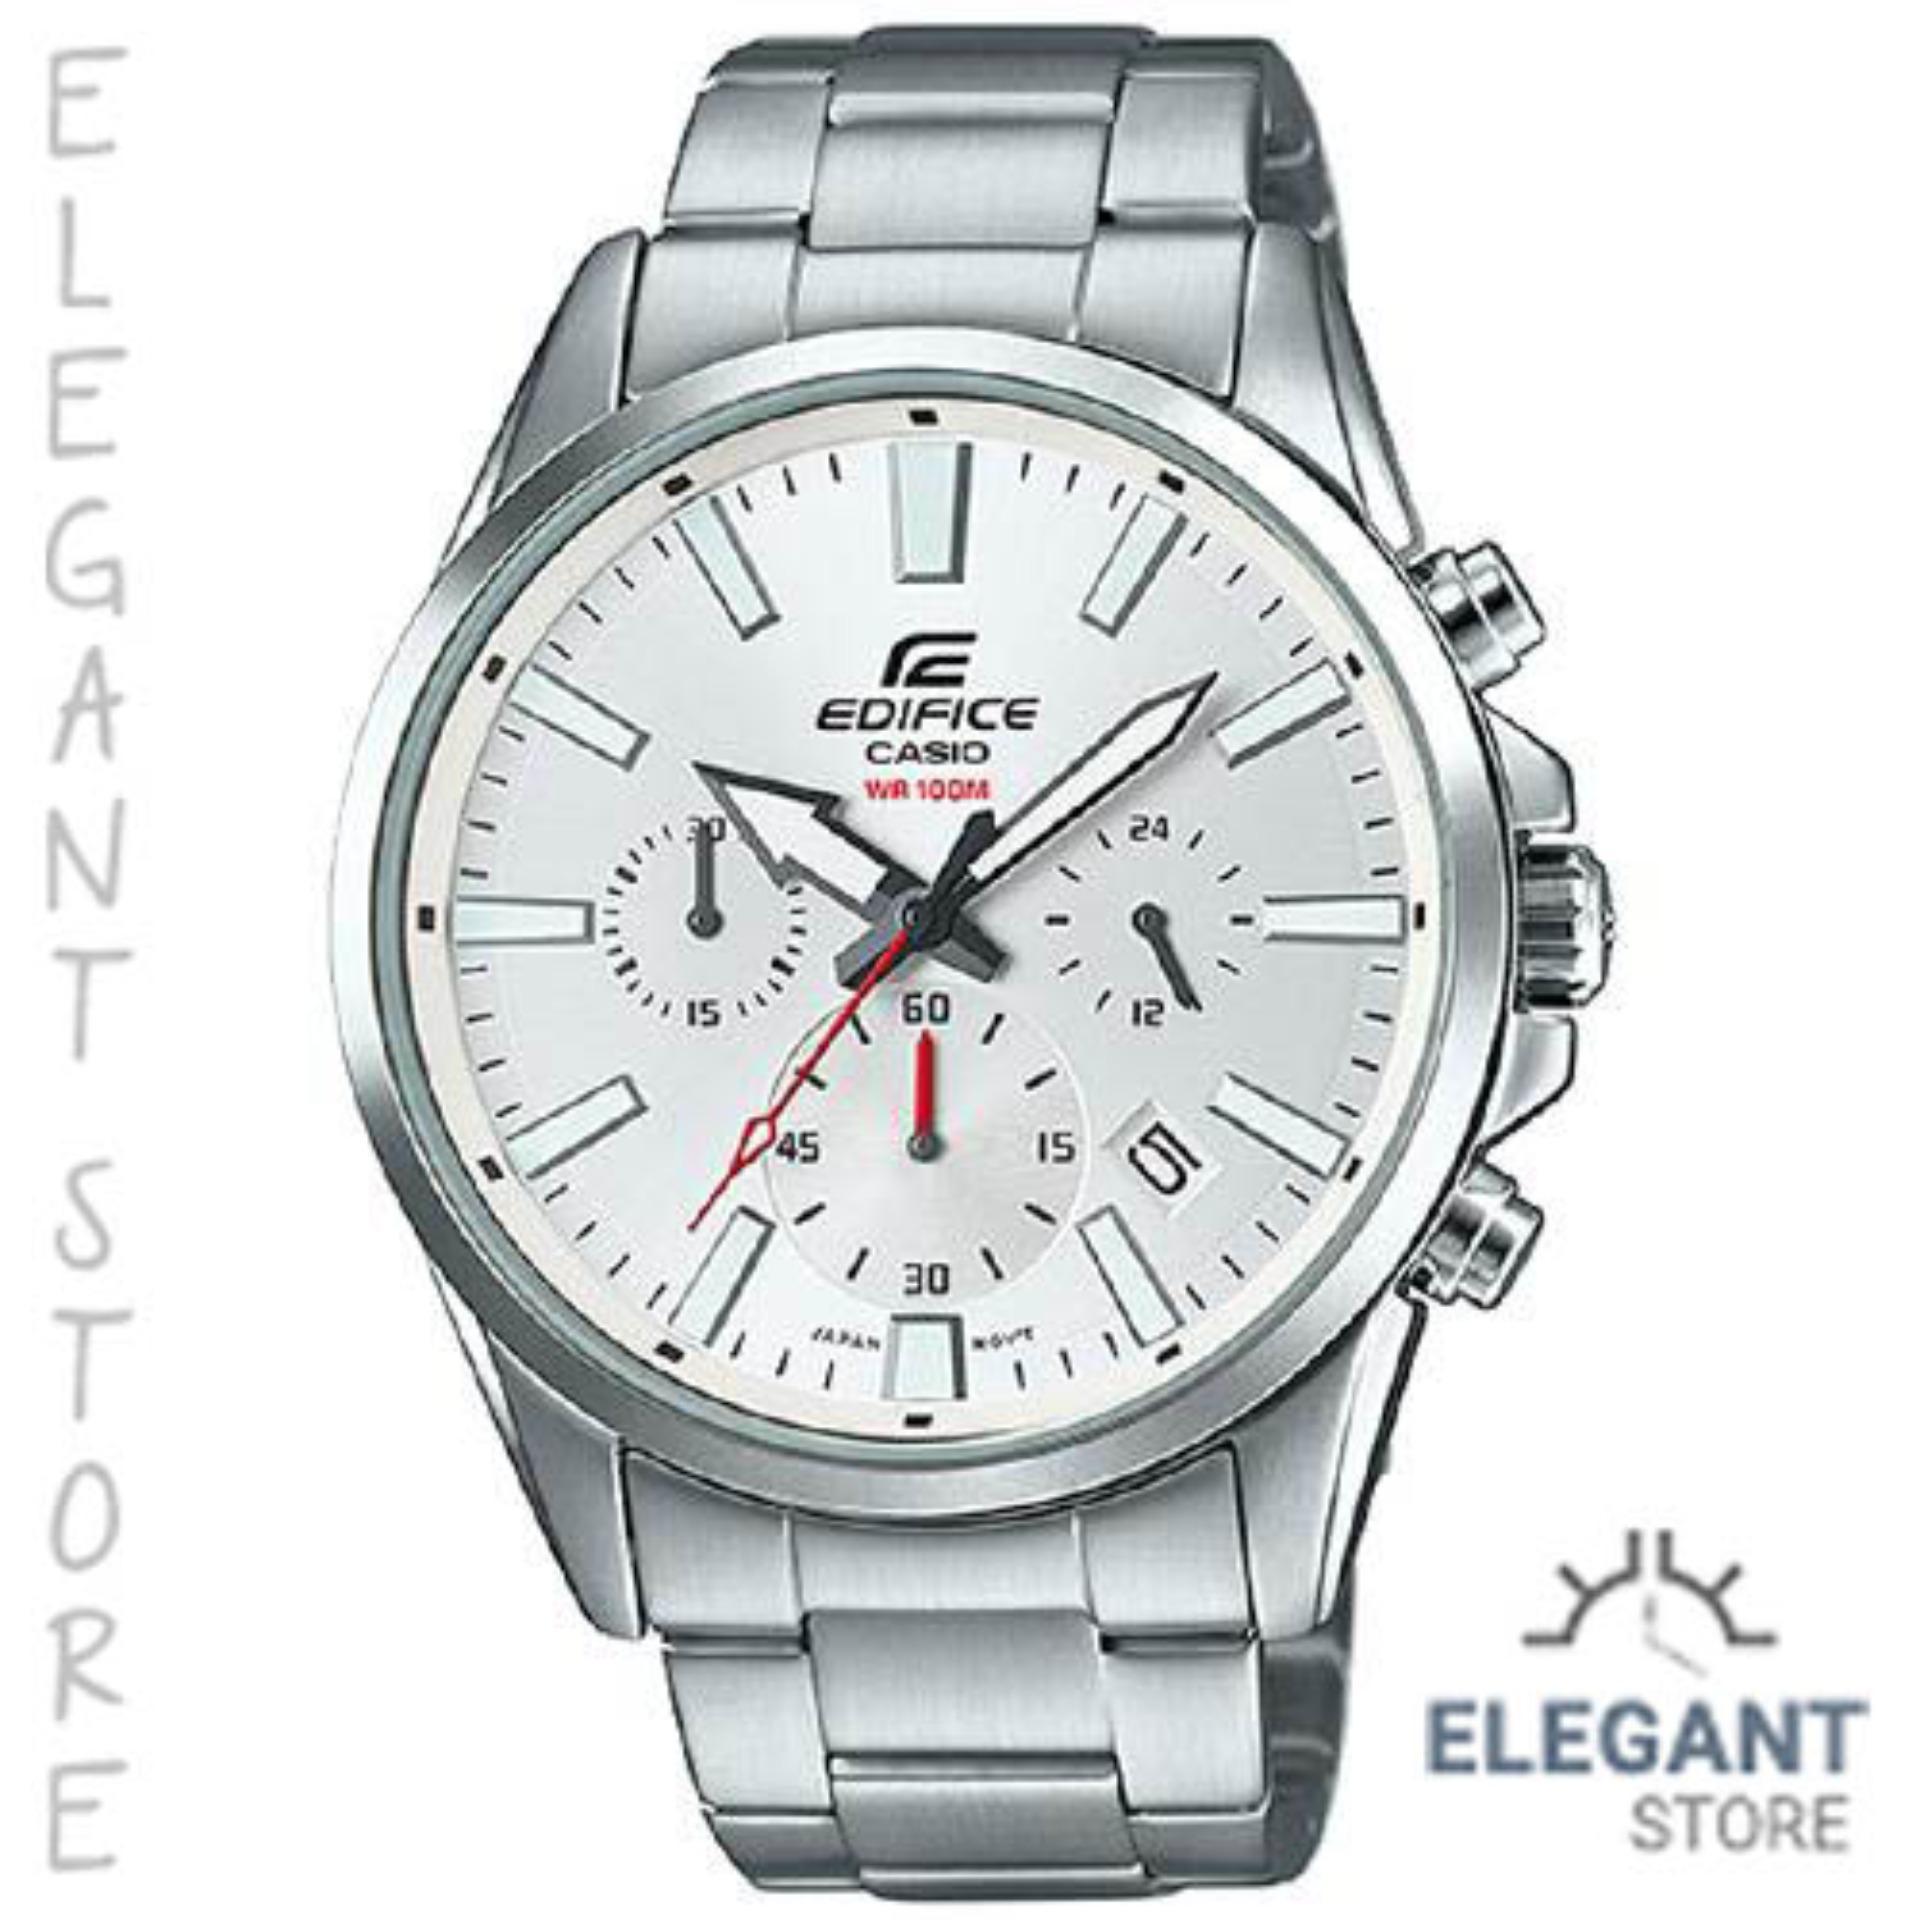 644180f66405 Casio Edifice EFV-510D-7A 100-meter water resistance men s watch Silver